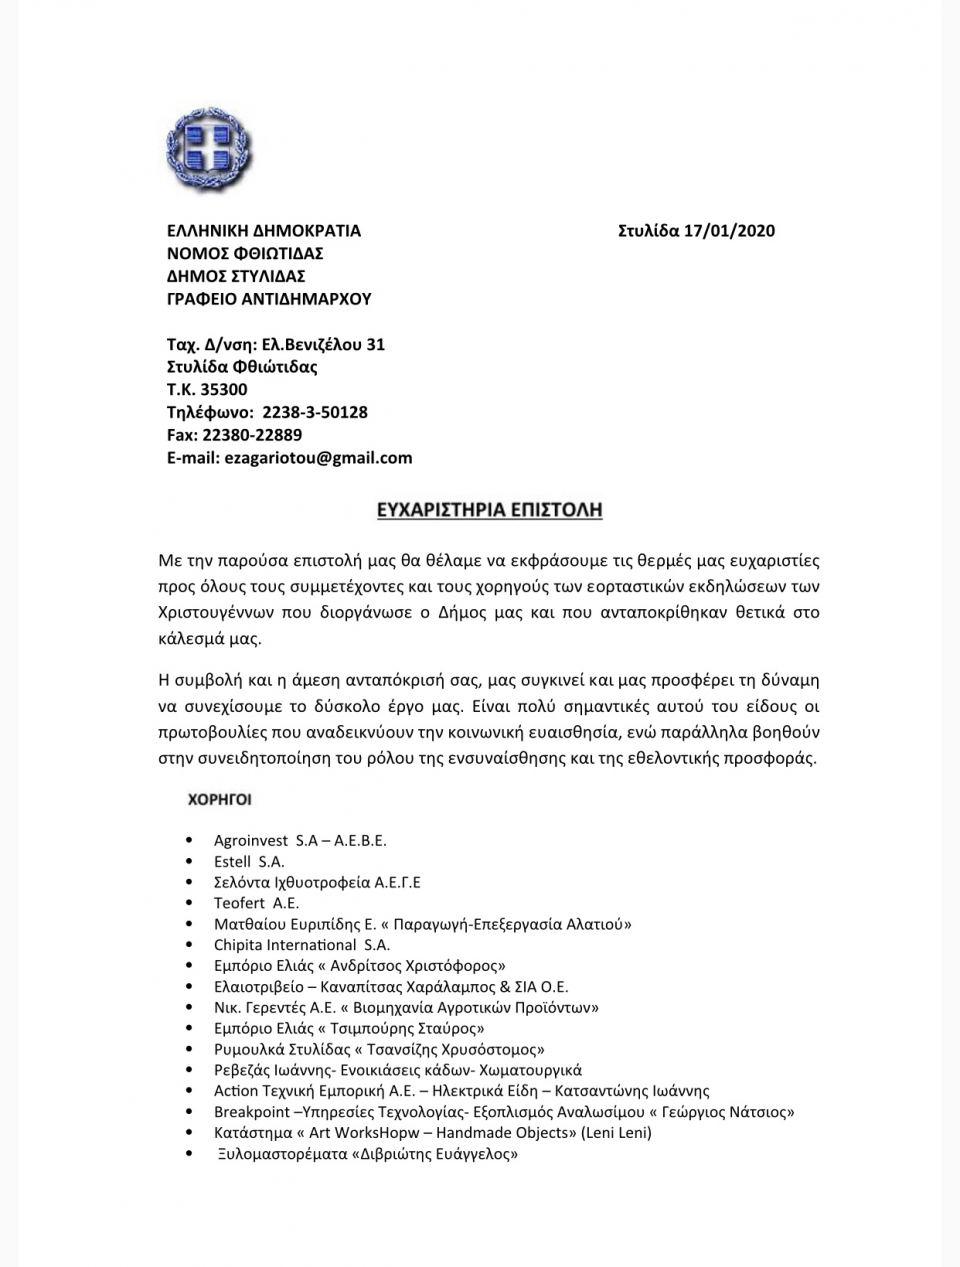 img 7086 ΧΡΙΣΤΟΥΓΕΝΝΑ 2019 ΣΤΥΛΙΔΑ ΕΥΧΑΡΙΣΤΗΡΙΑ ΕΠΙΣΤΟΛΗ ΔΗΜΟΣ ΣΤΥΛΙΔΑΣ